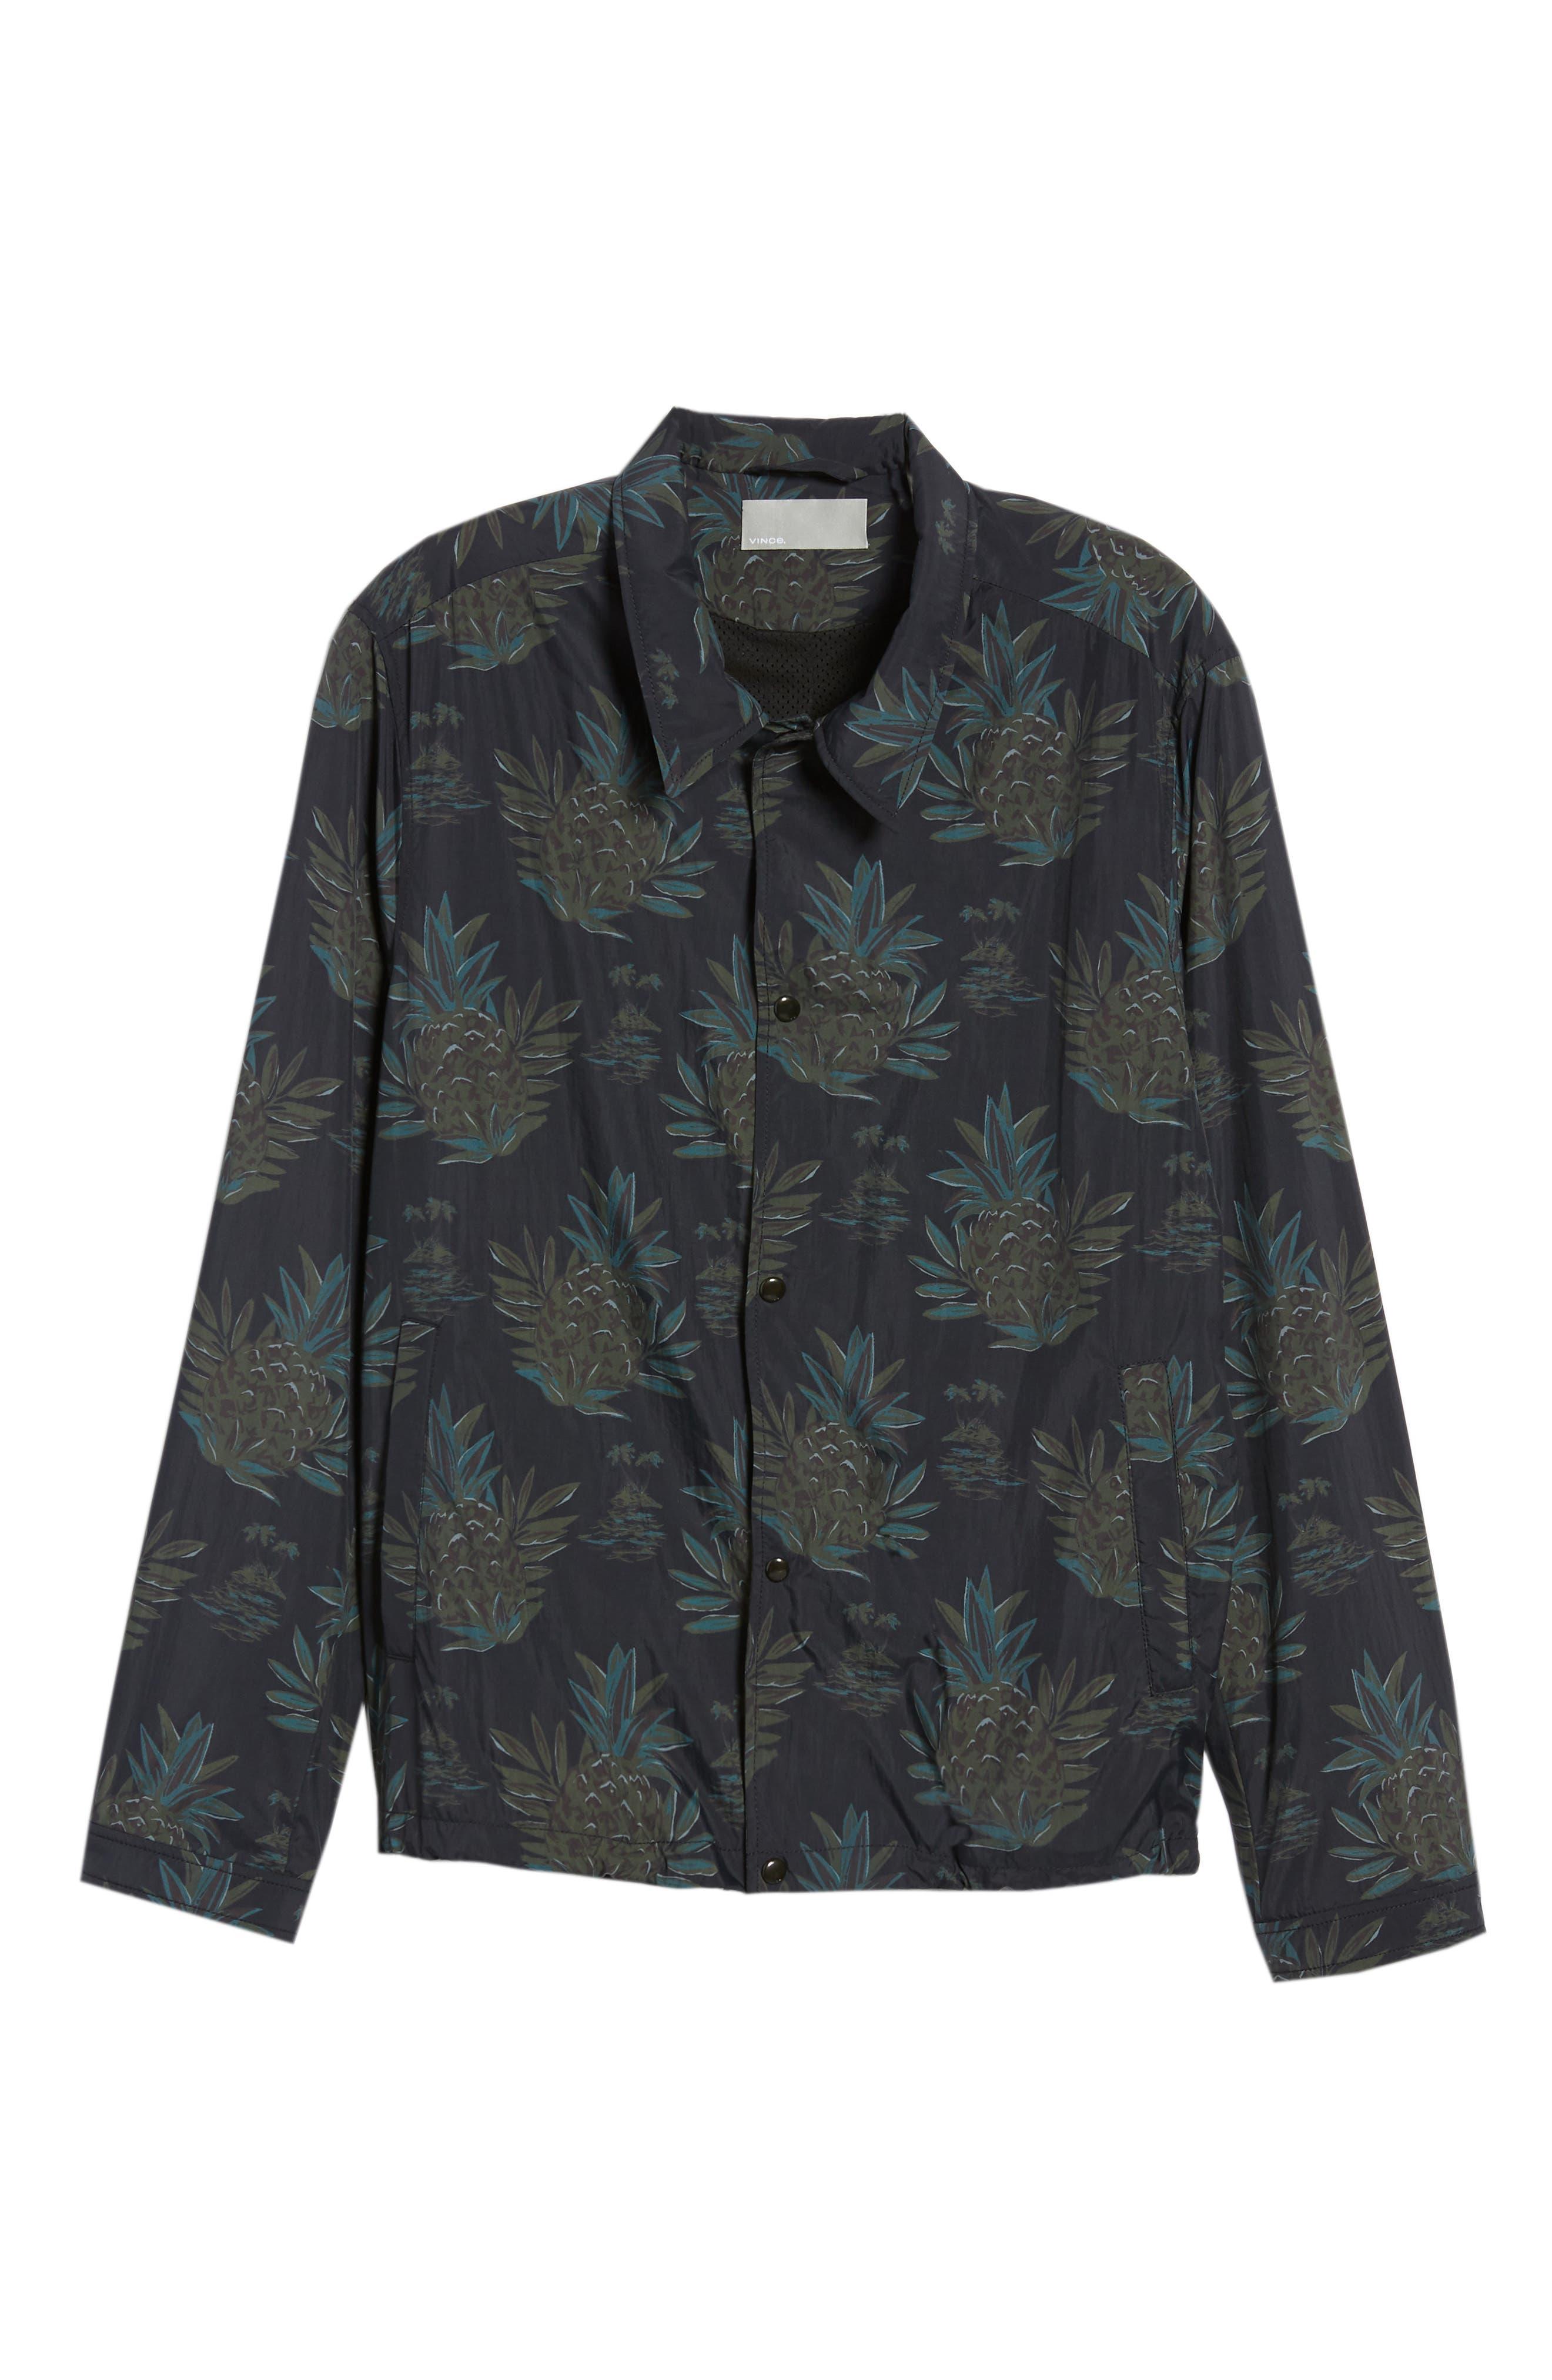 Tropical Regular Fit Coach's Jacket,                             Alternate thumbnail 6, color,                             New Coastal